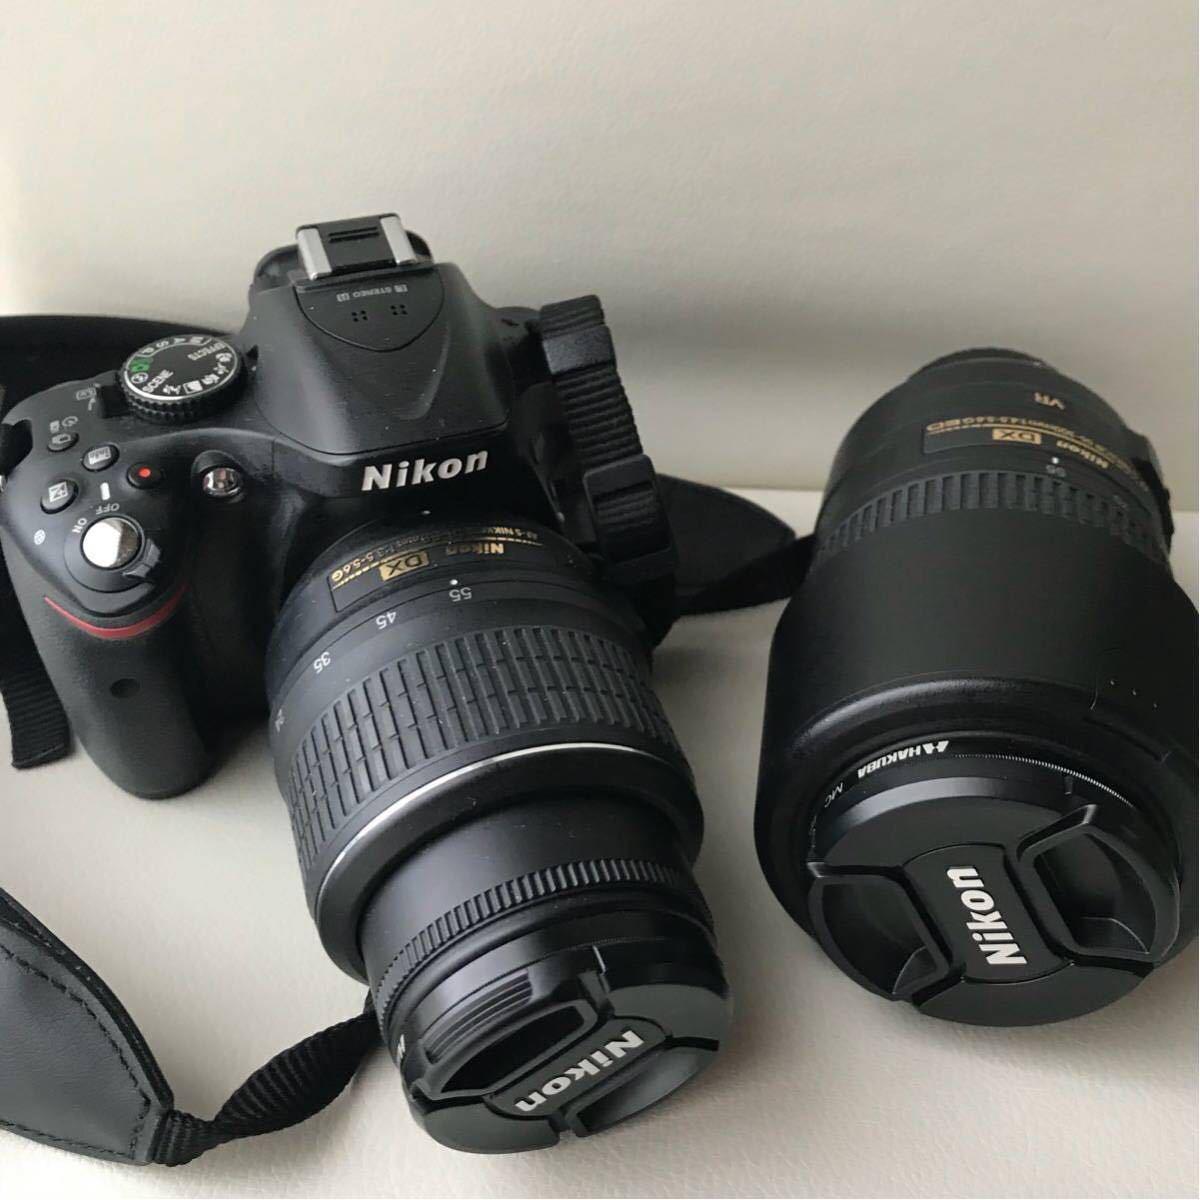 NIKON D5200一眼レフカメラ 望遠レンズ付き